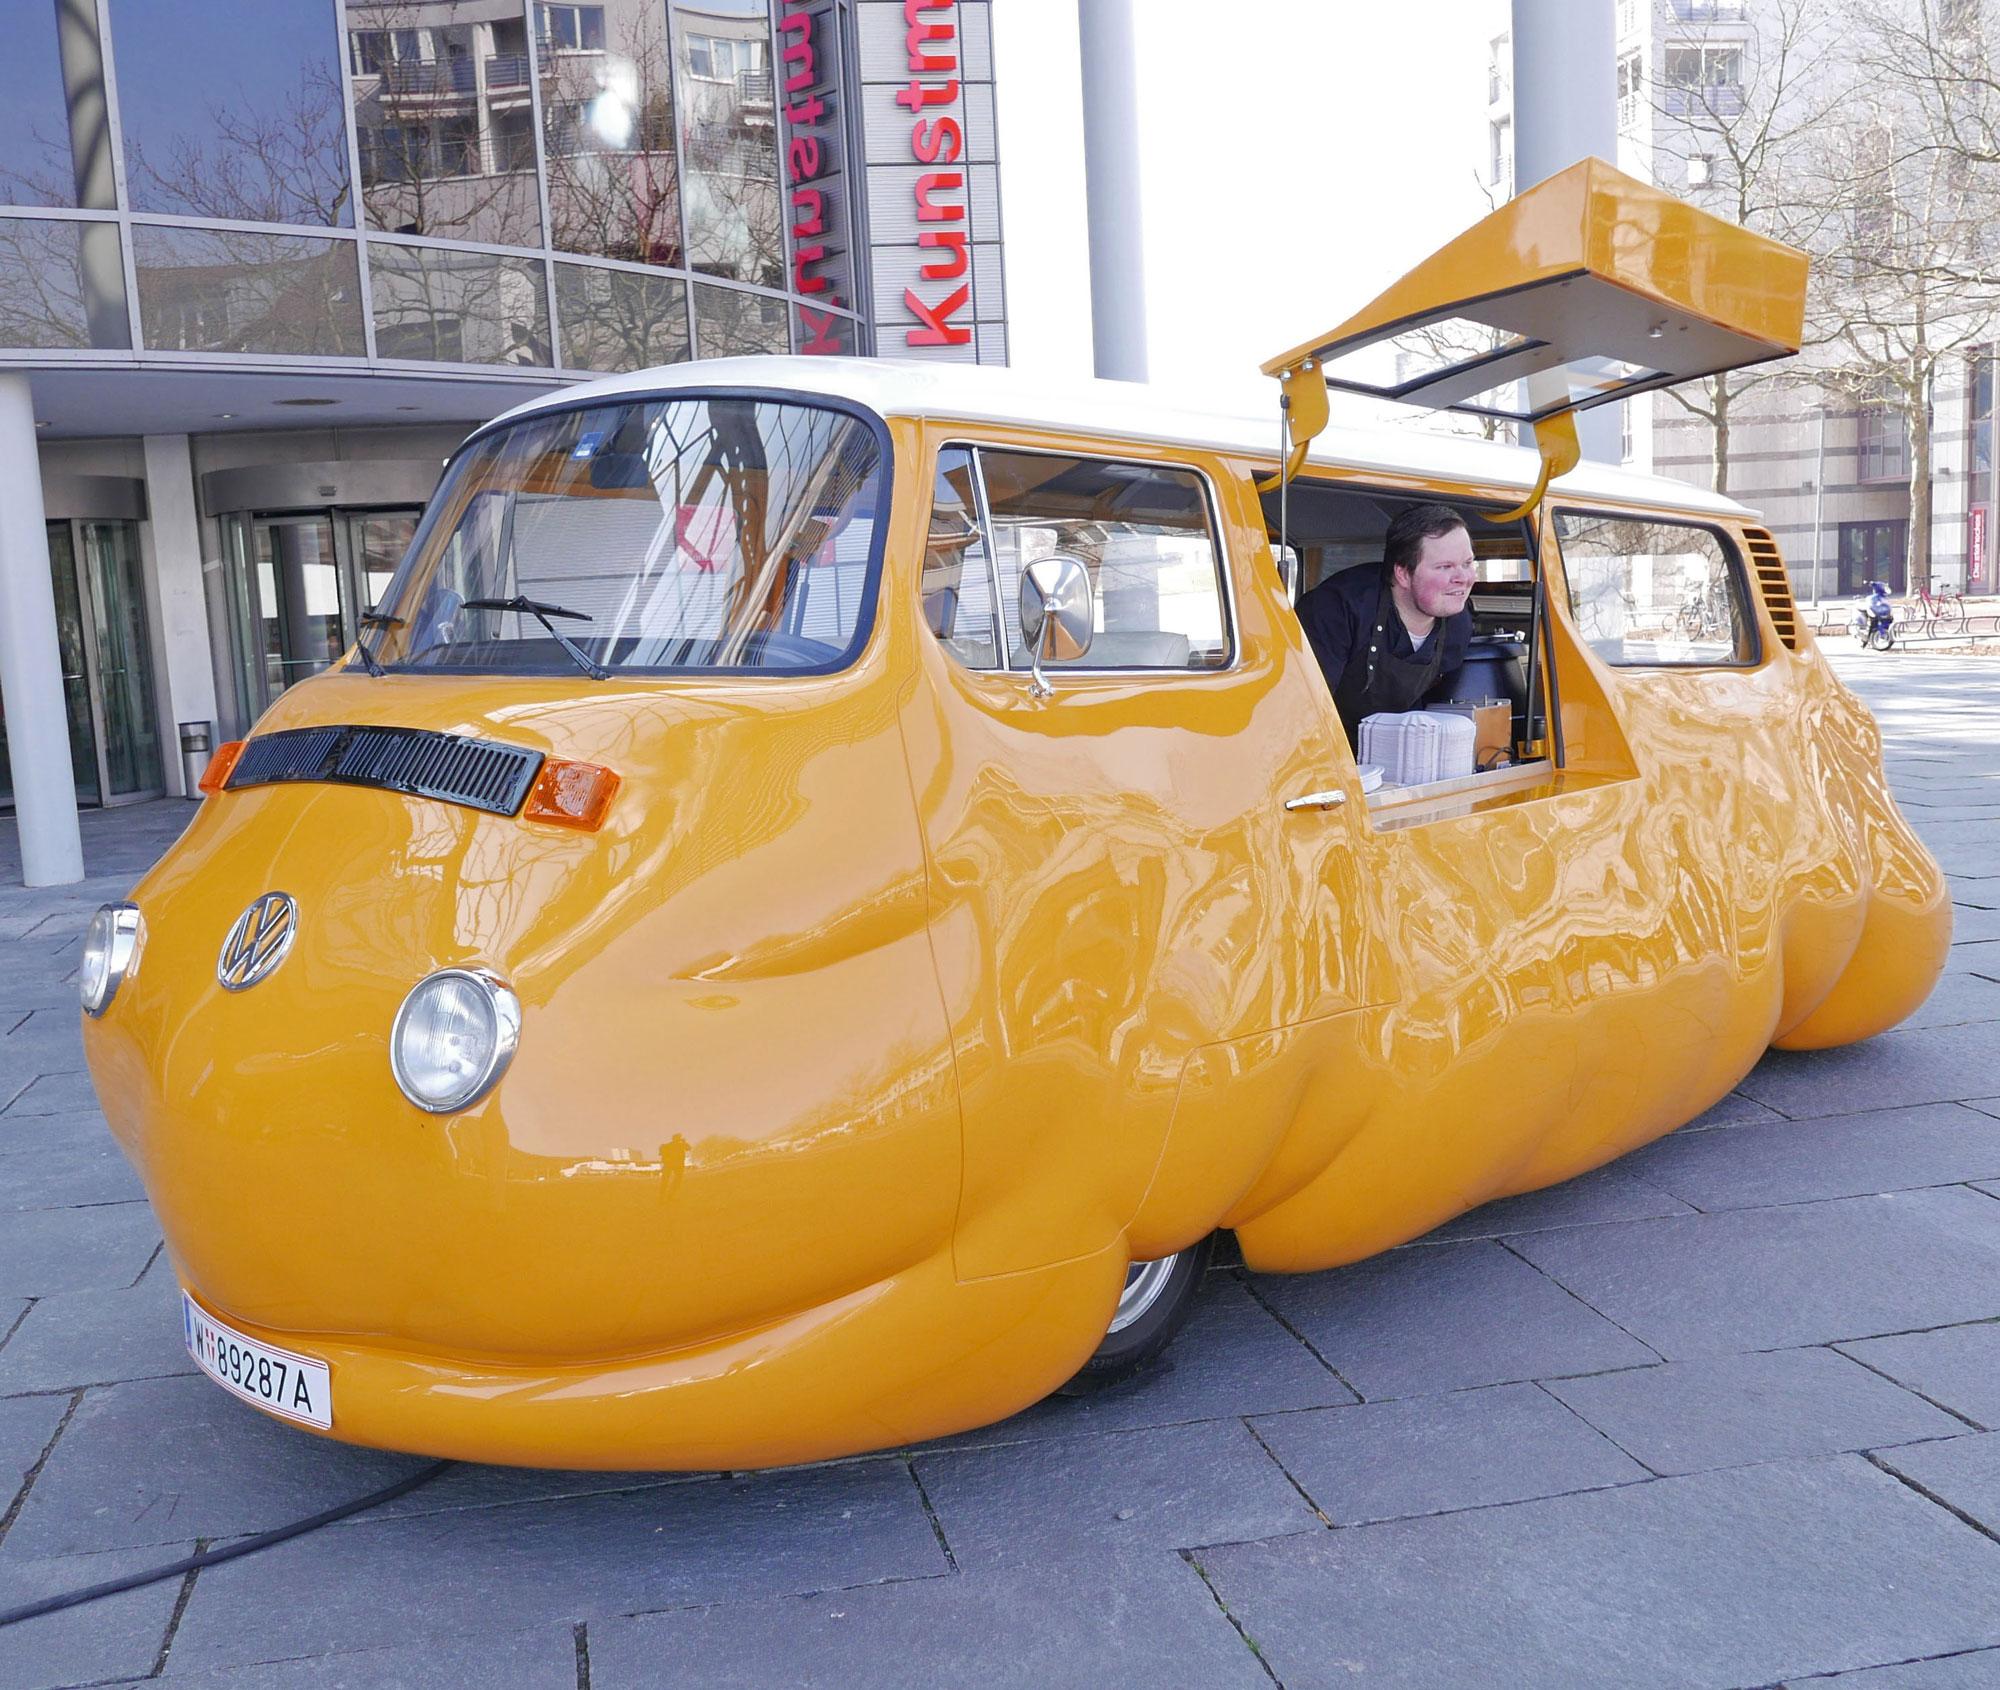 Wilhelm Lehmbruck: Erwin Wurm, Curry Bus, 2015, styrofoam, polyure- than, bus, © Erwin Wurm / VG Bild-Kunst, Bonn 2017